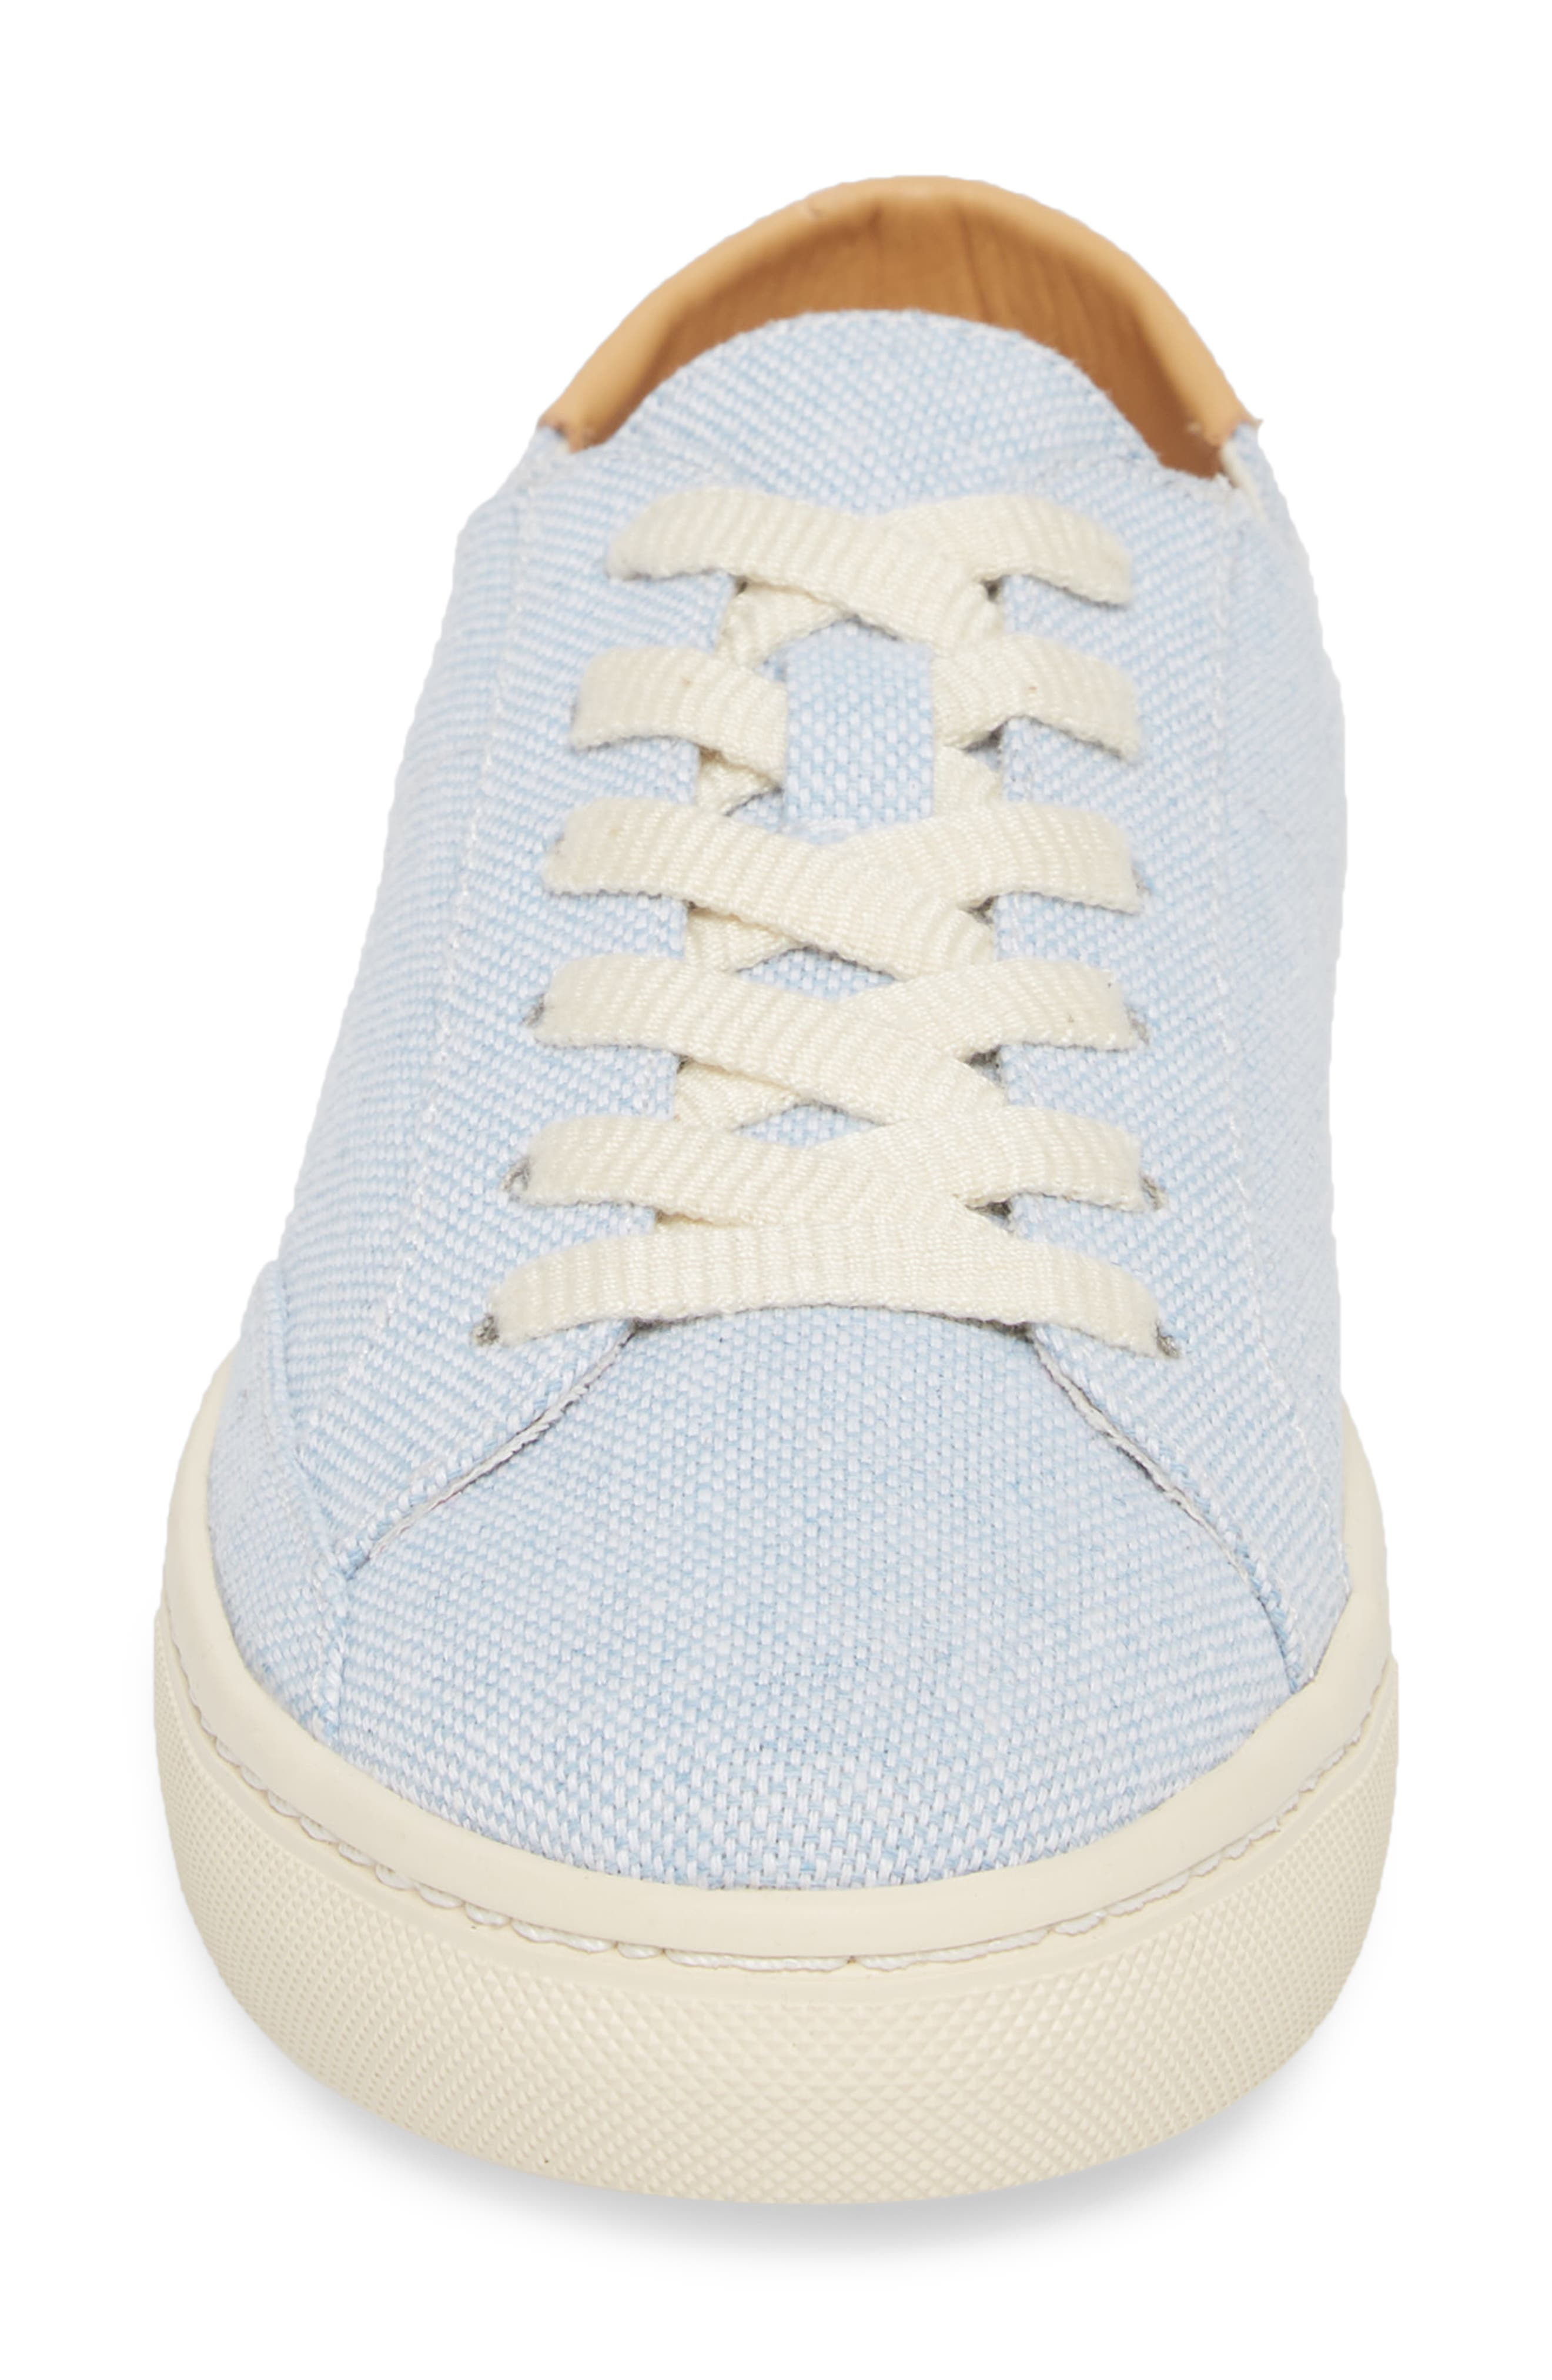 Ibiza Canvas Lace-Up Sneaker,                             Alternate thumbnail 4, color,                             Sky Blue